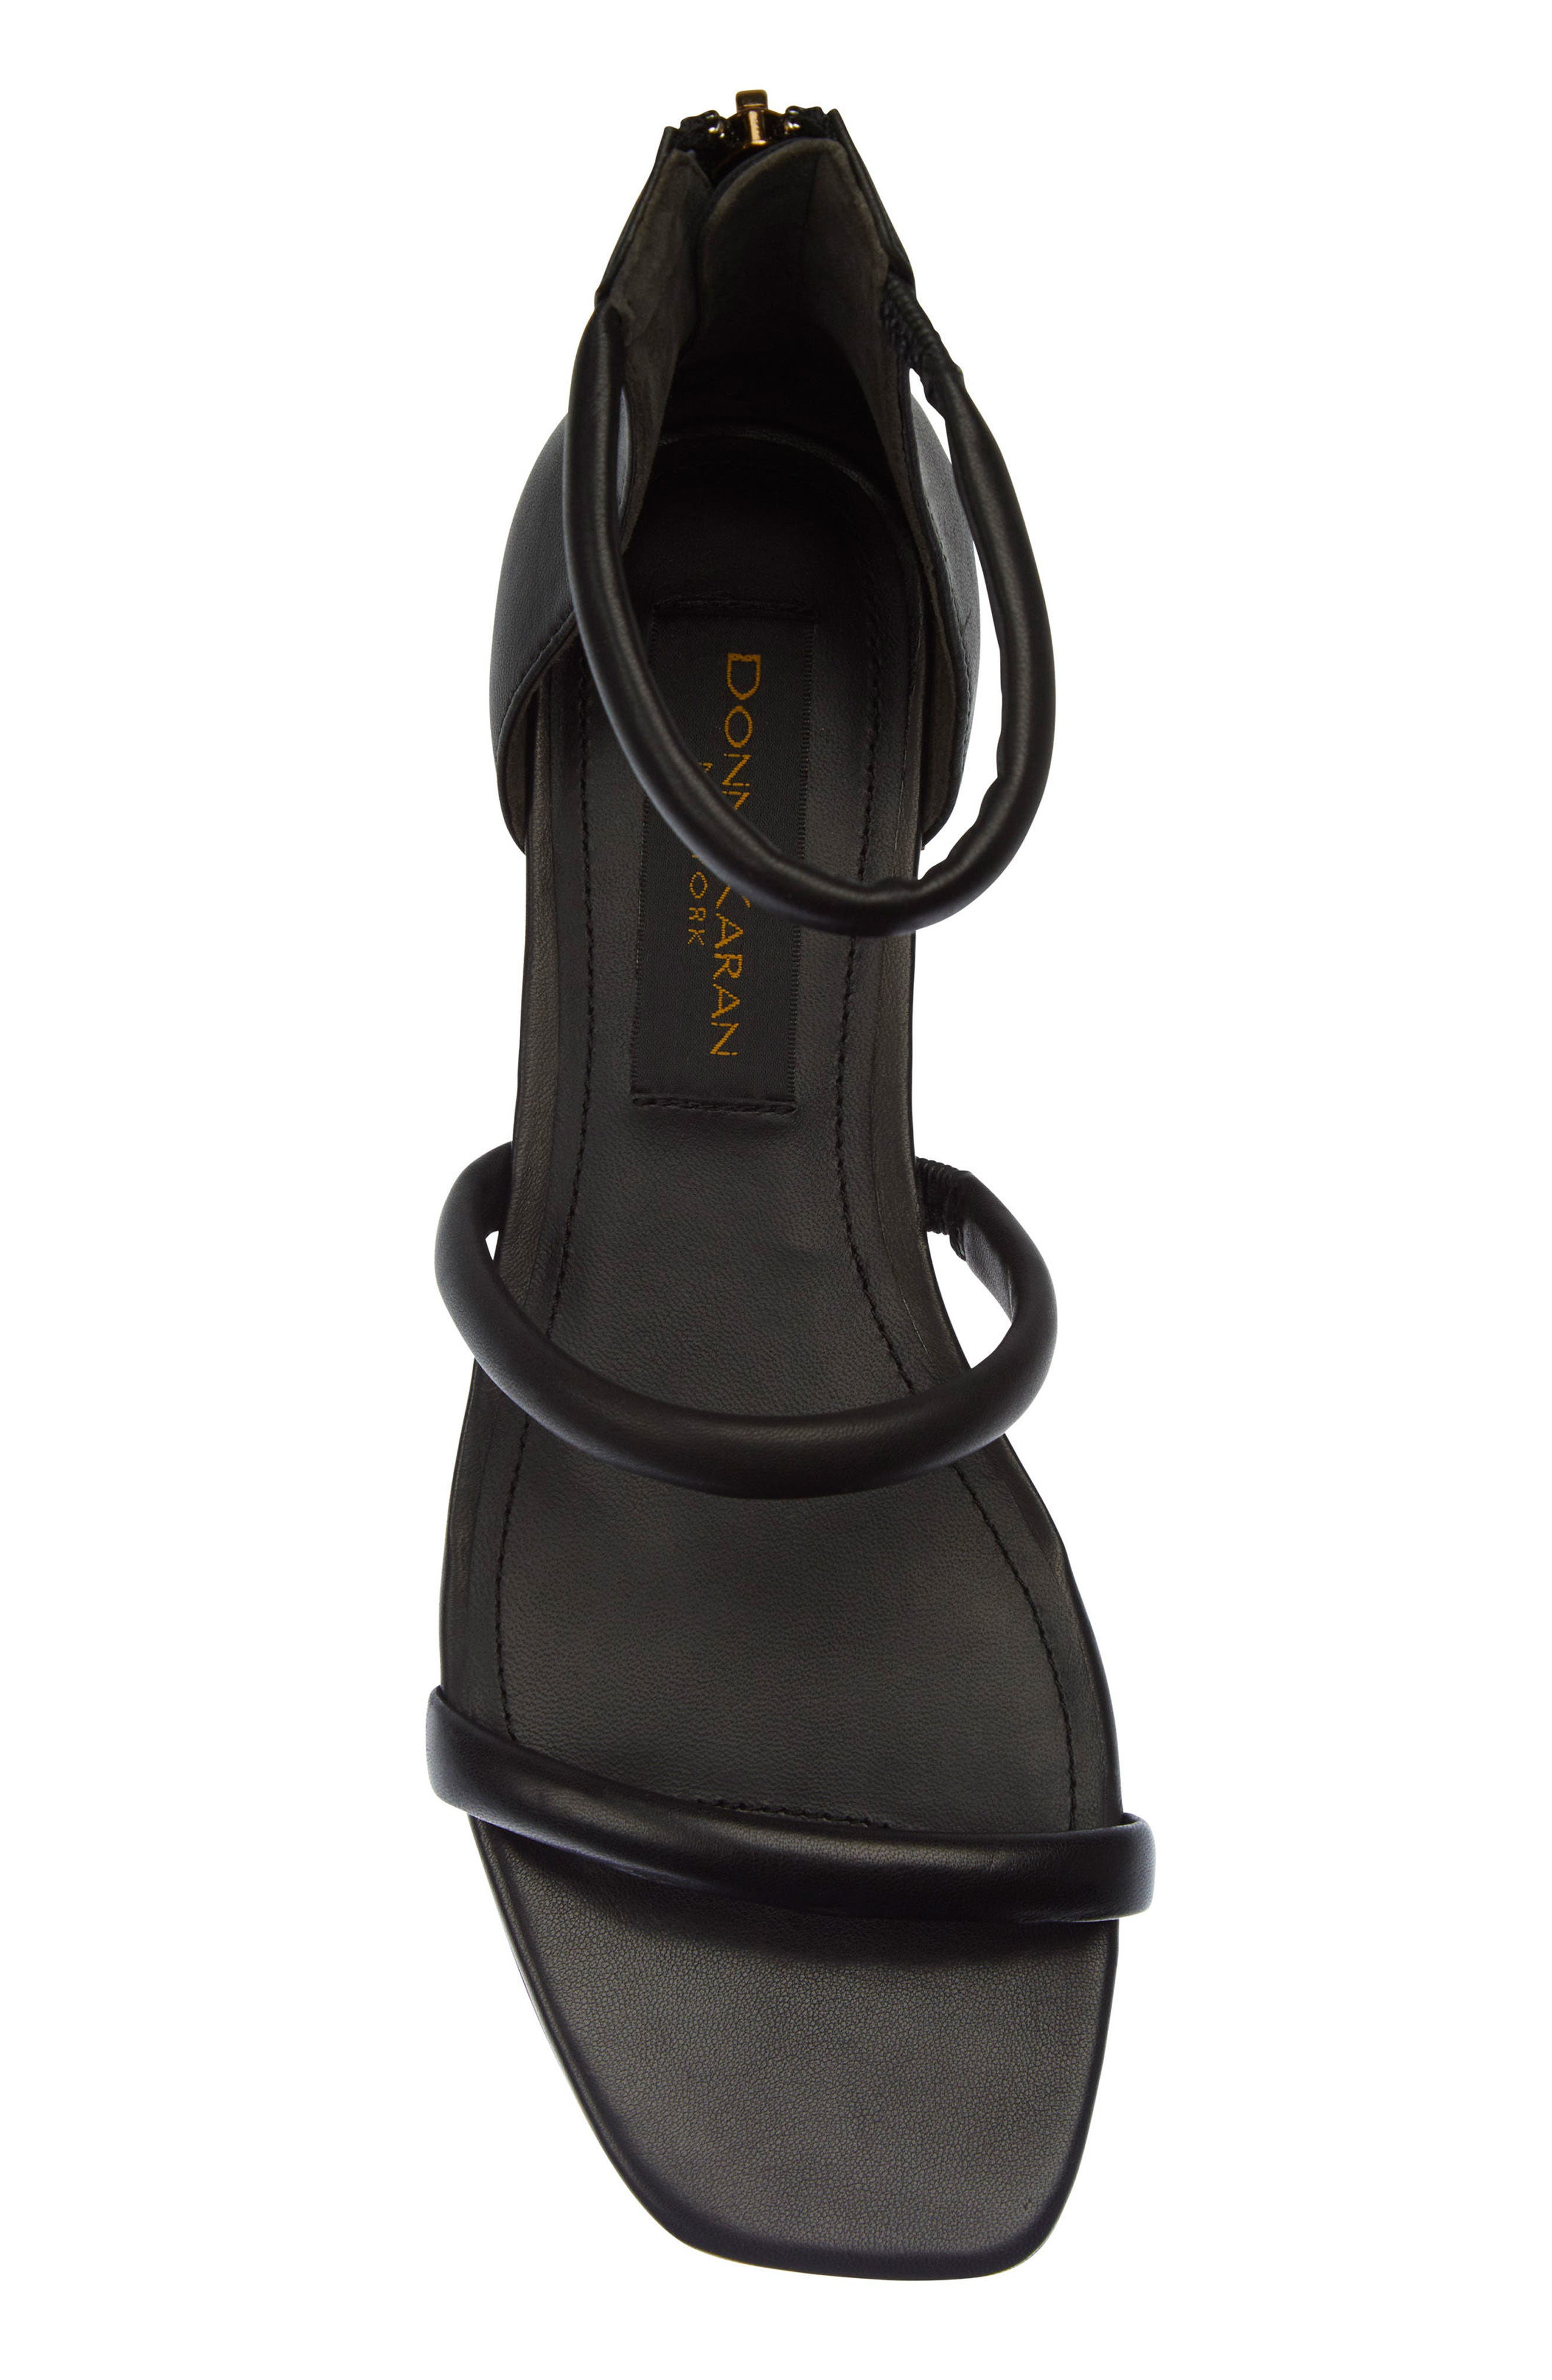 Donna Karan Galina Sandal,                             Alternate thumbnail 5, color,                             Black Leather